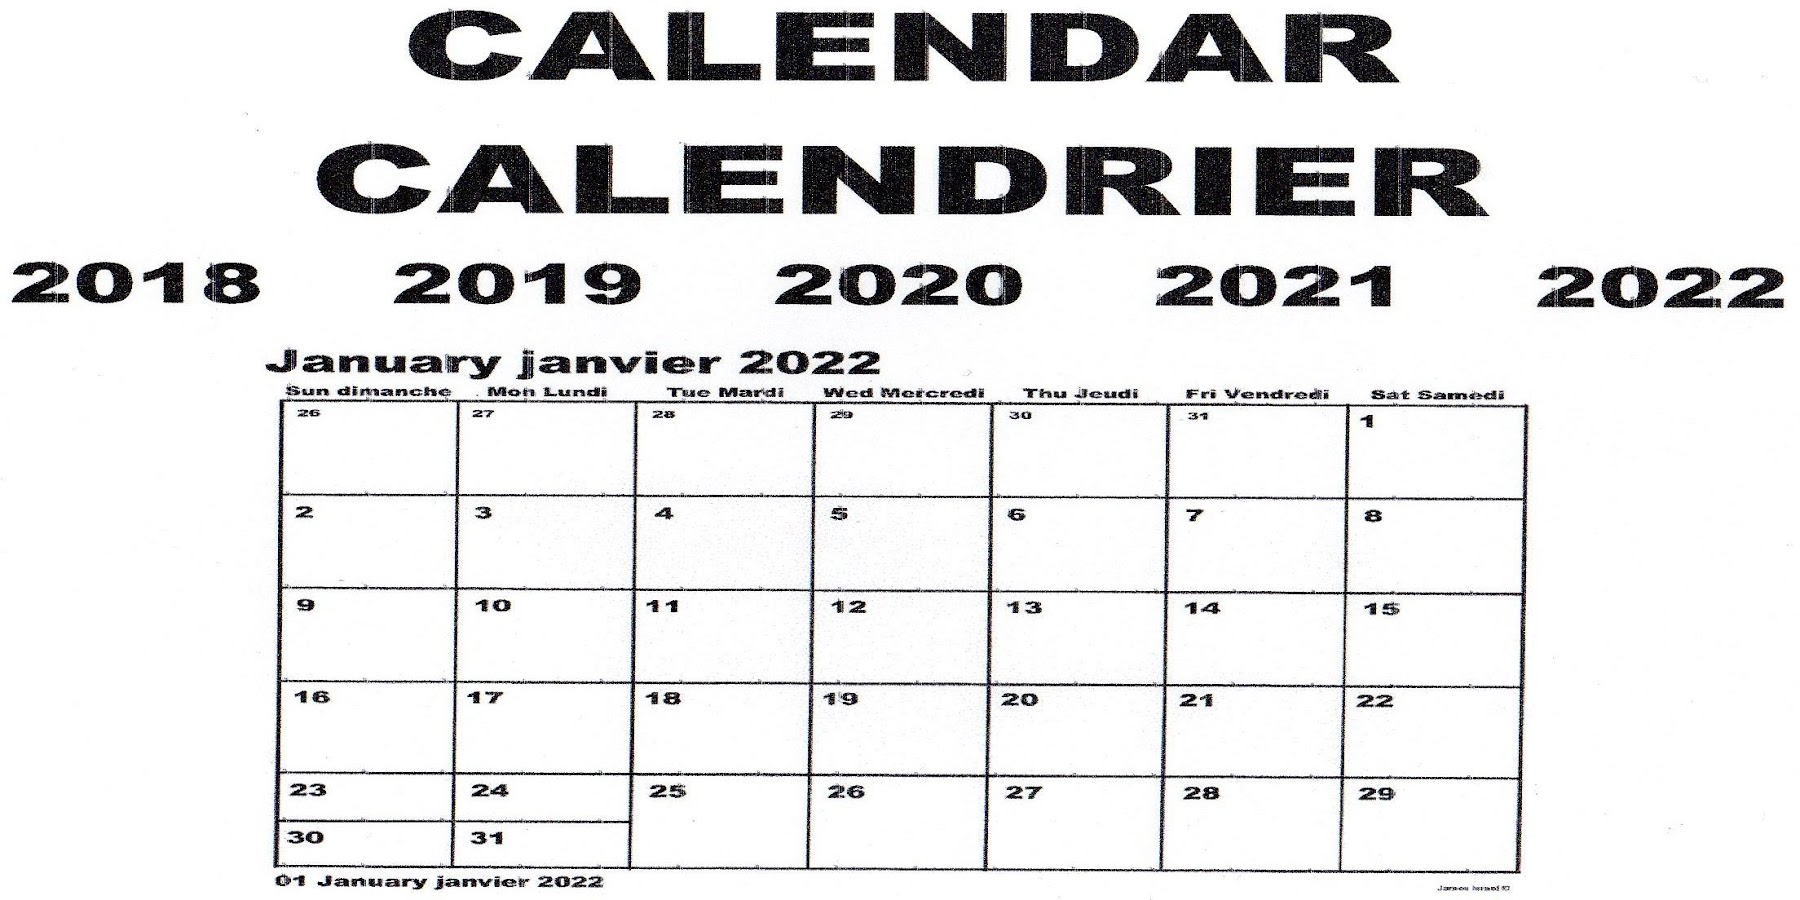 Nyc School Calendar 2020 2021.Calendar Canada 2018 2019 2020 2021 2022 1 0 Apk Download